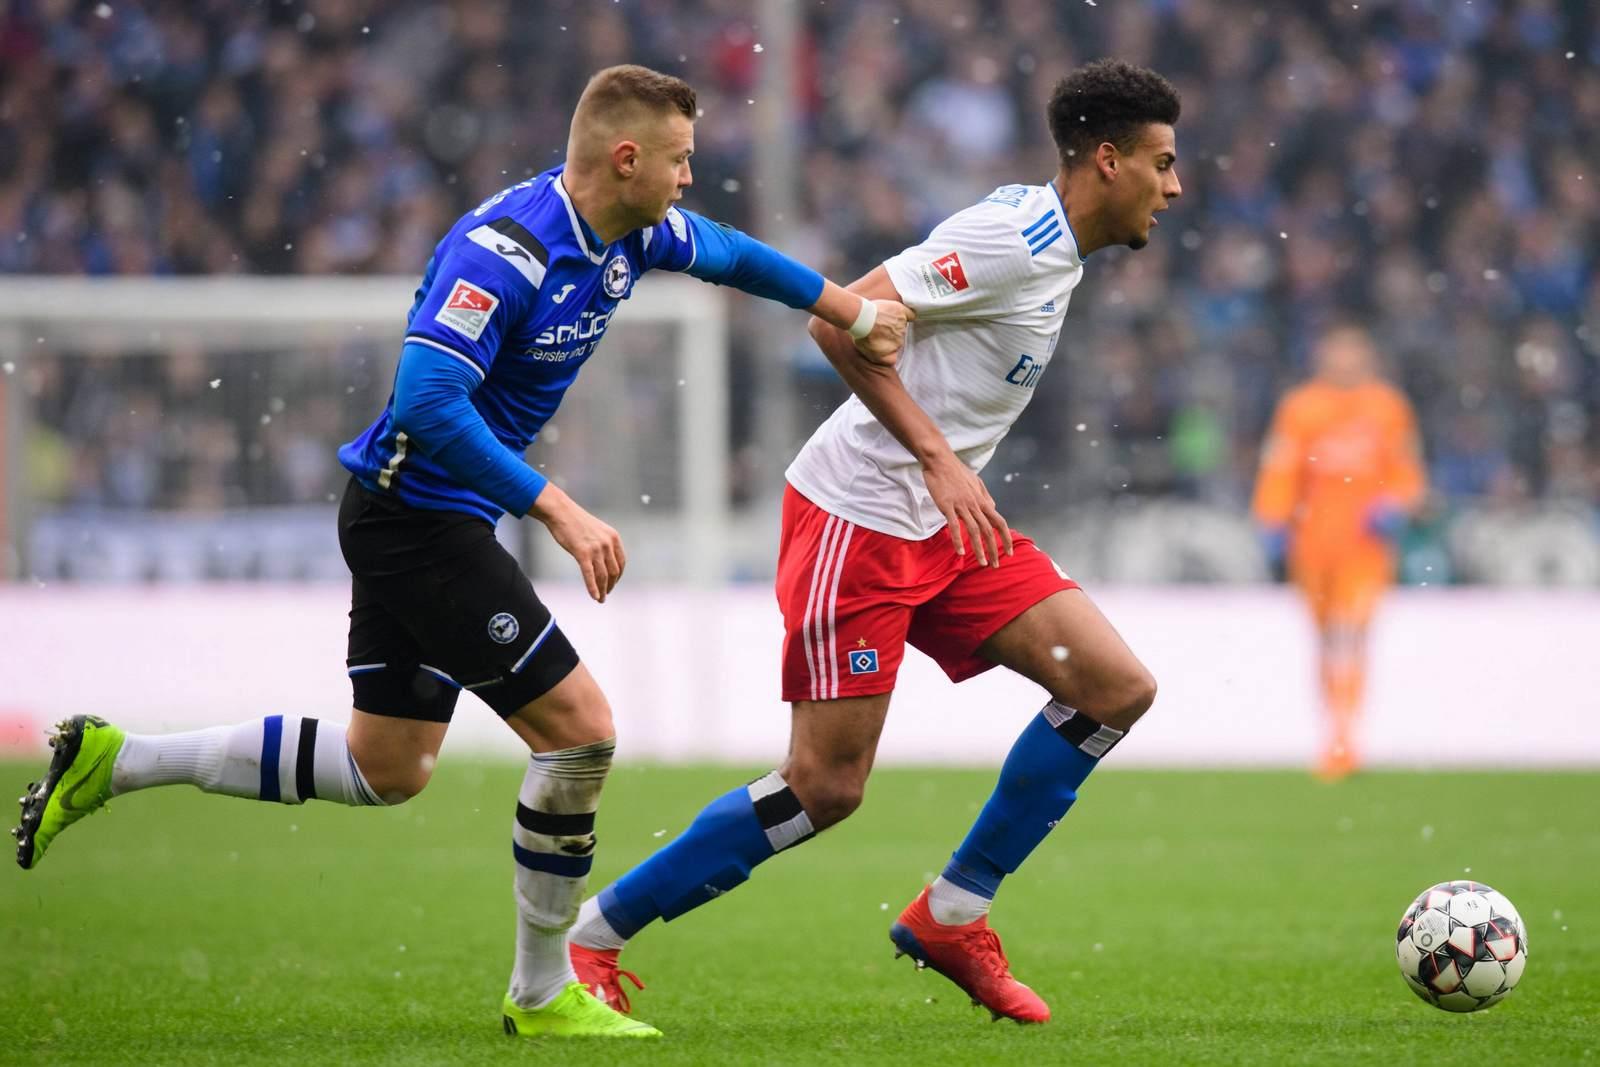 Bielefelds Florian Hartherz (l.) gegen Hamburgs Josha Vagnoman.